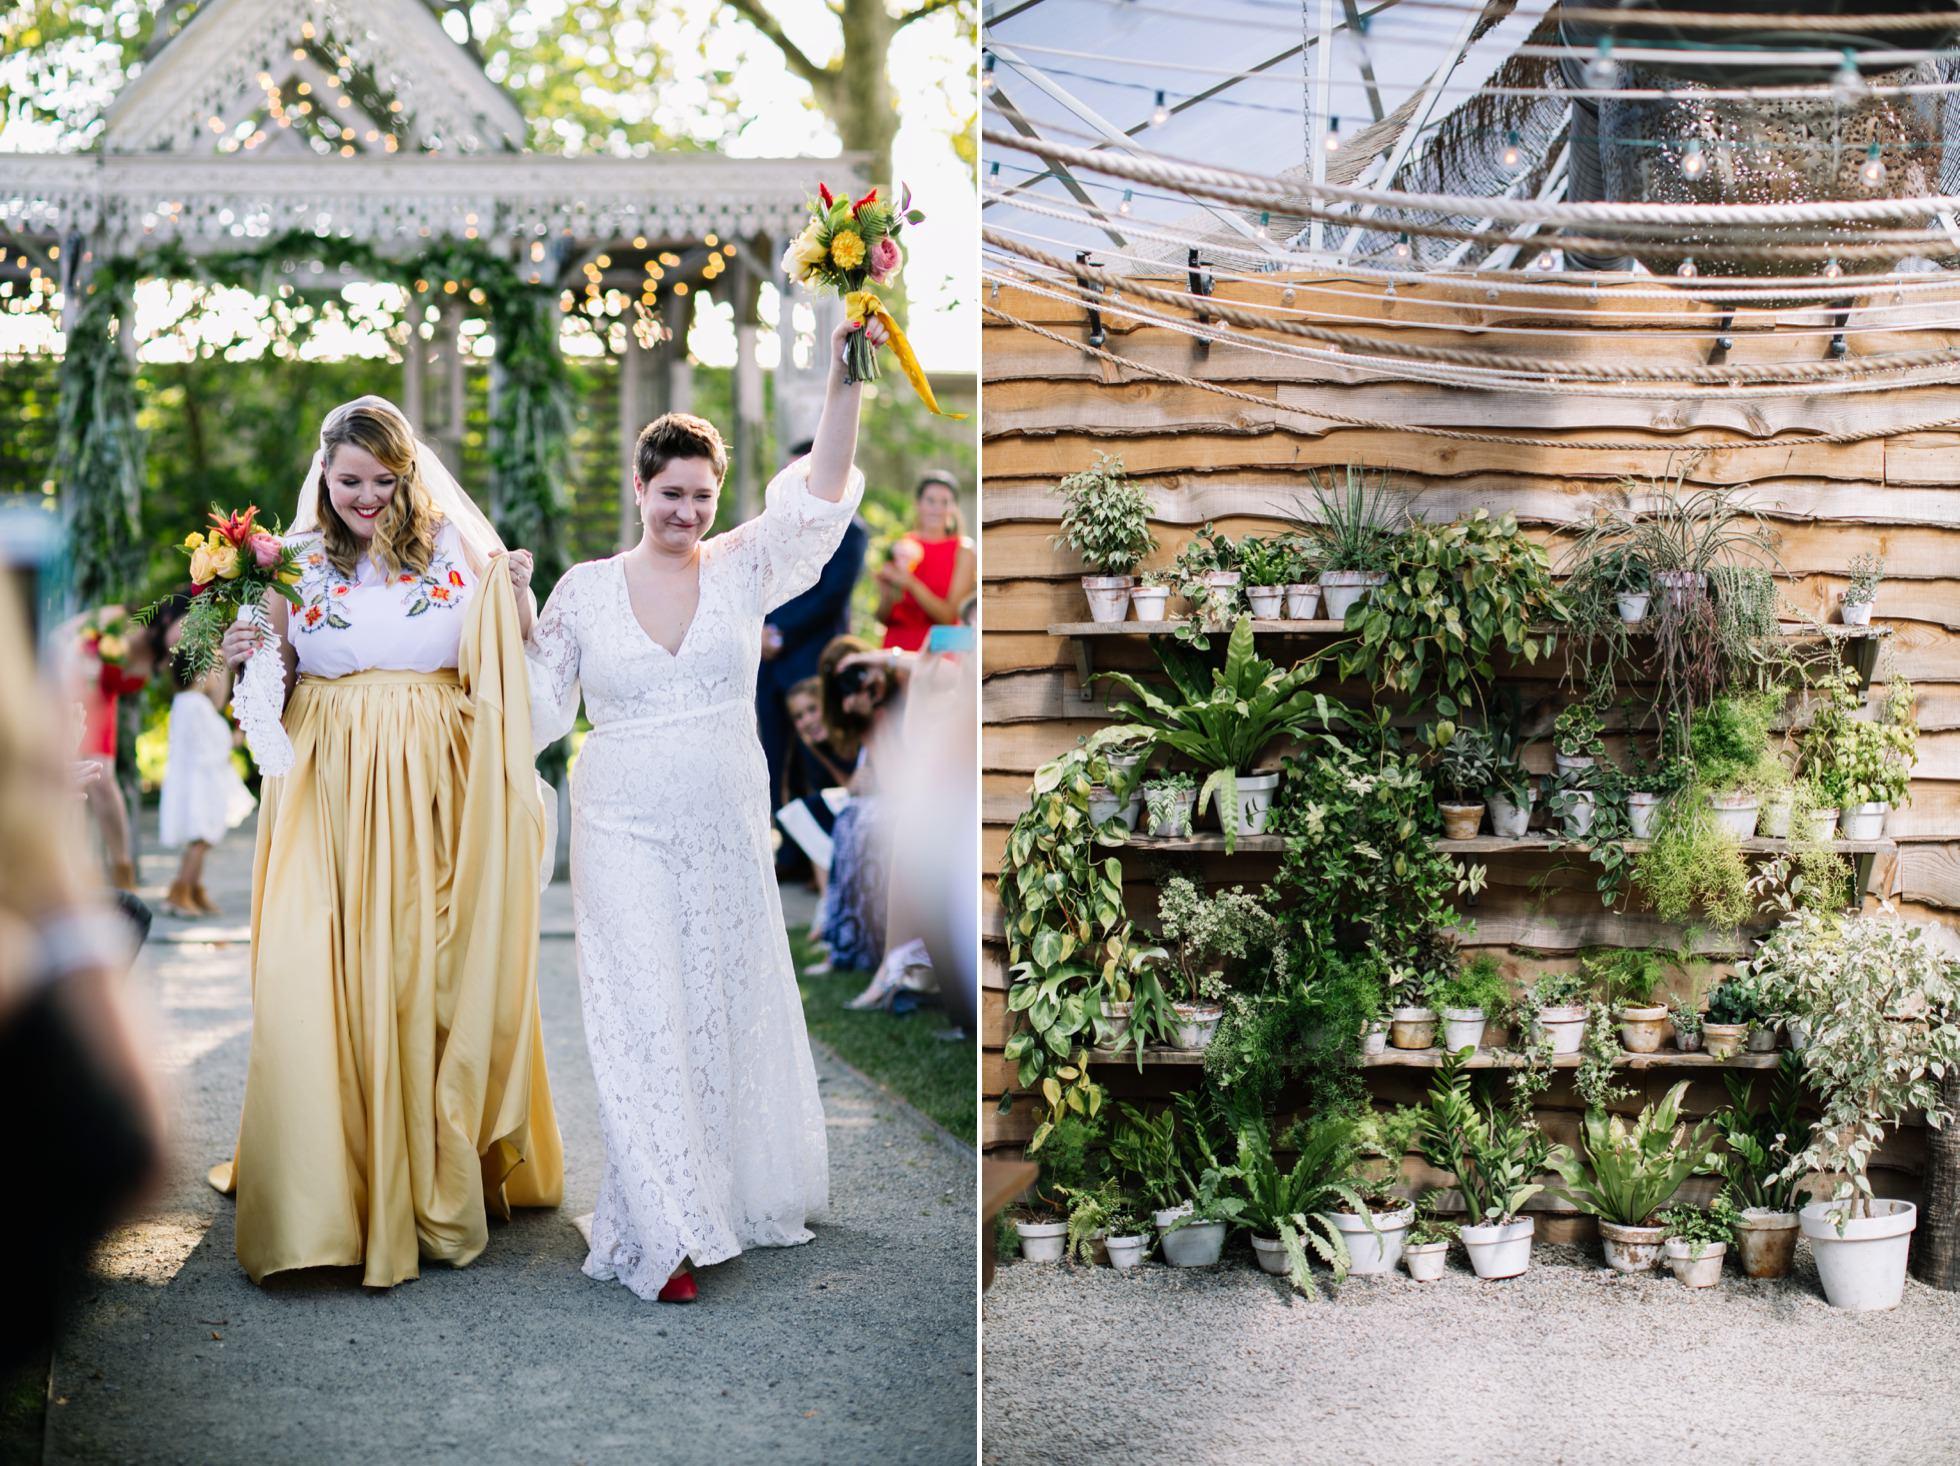 Best Unique Pa Ny Nj Wedding Venues Terrain Anthropologie Garden